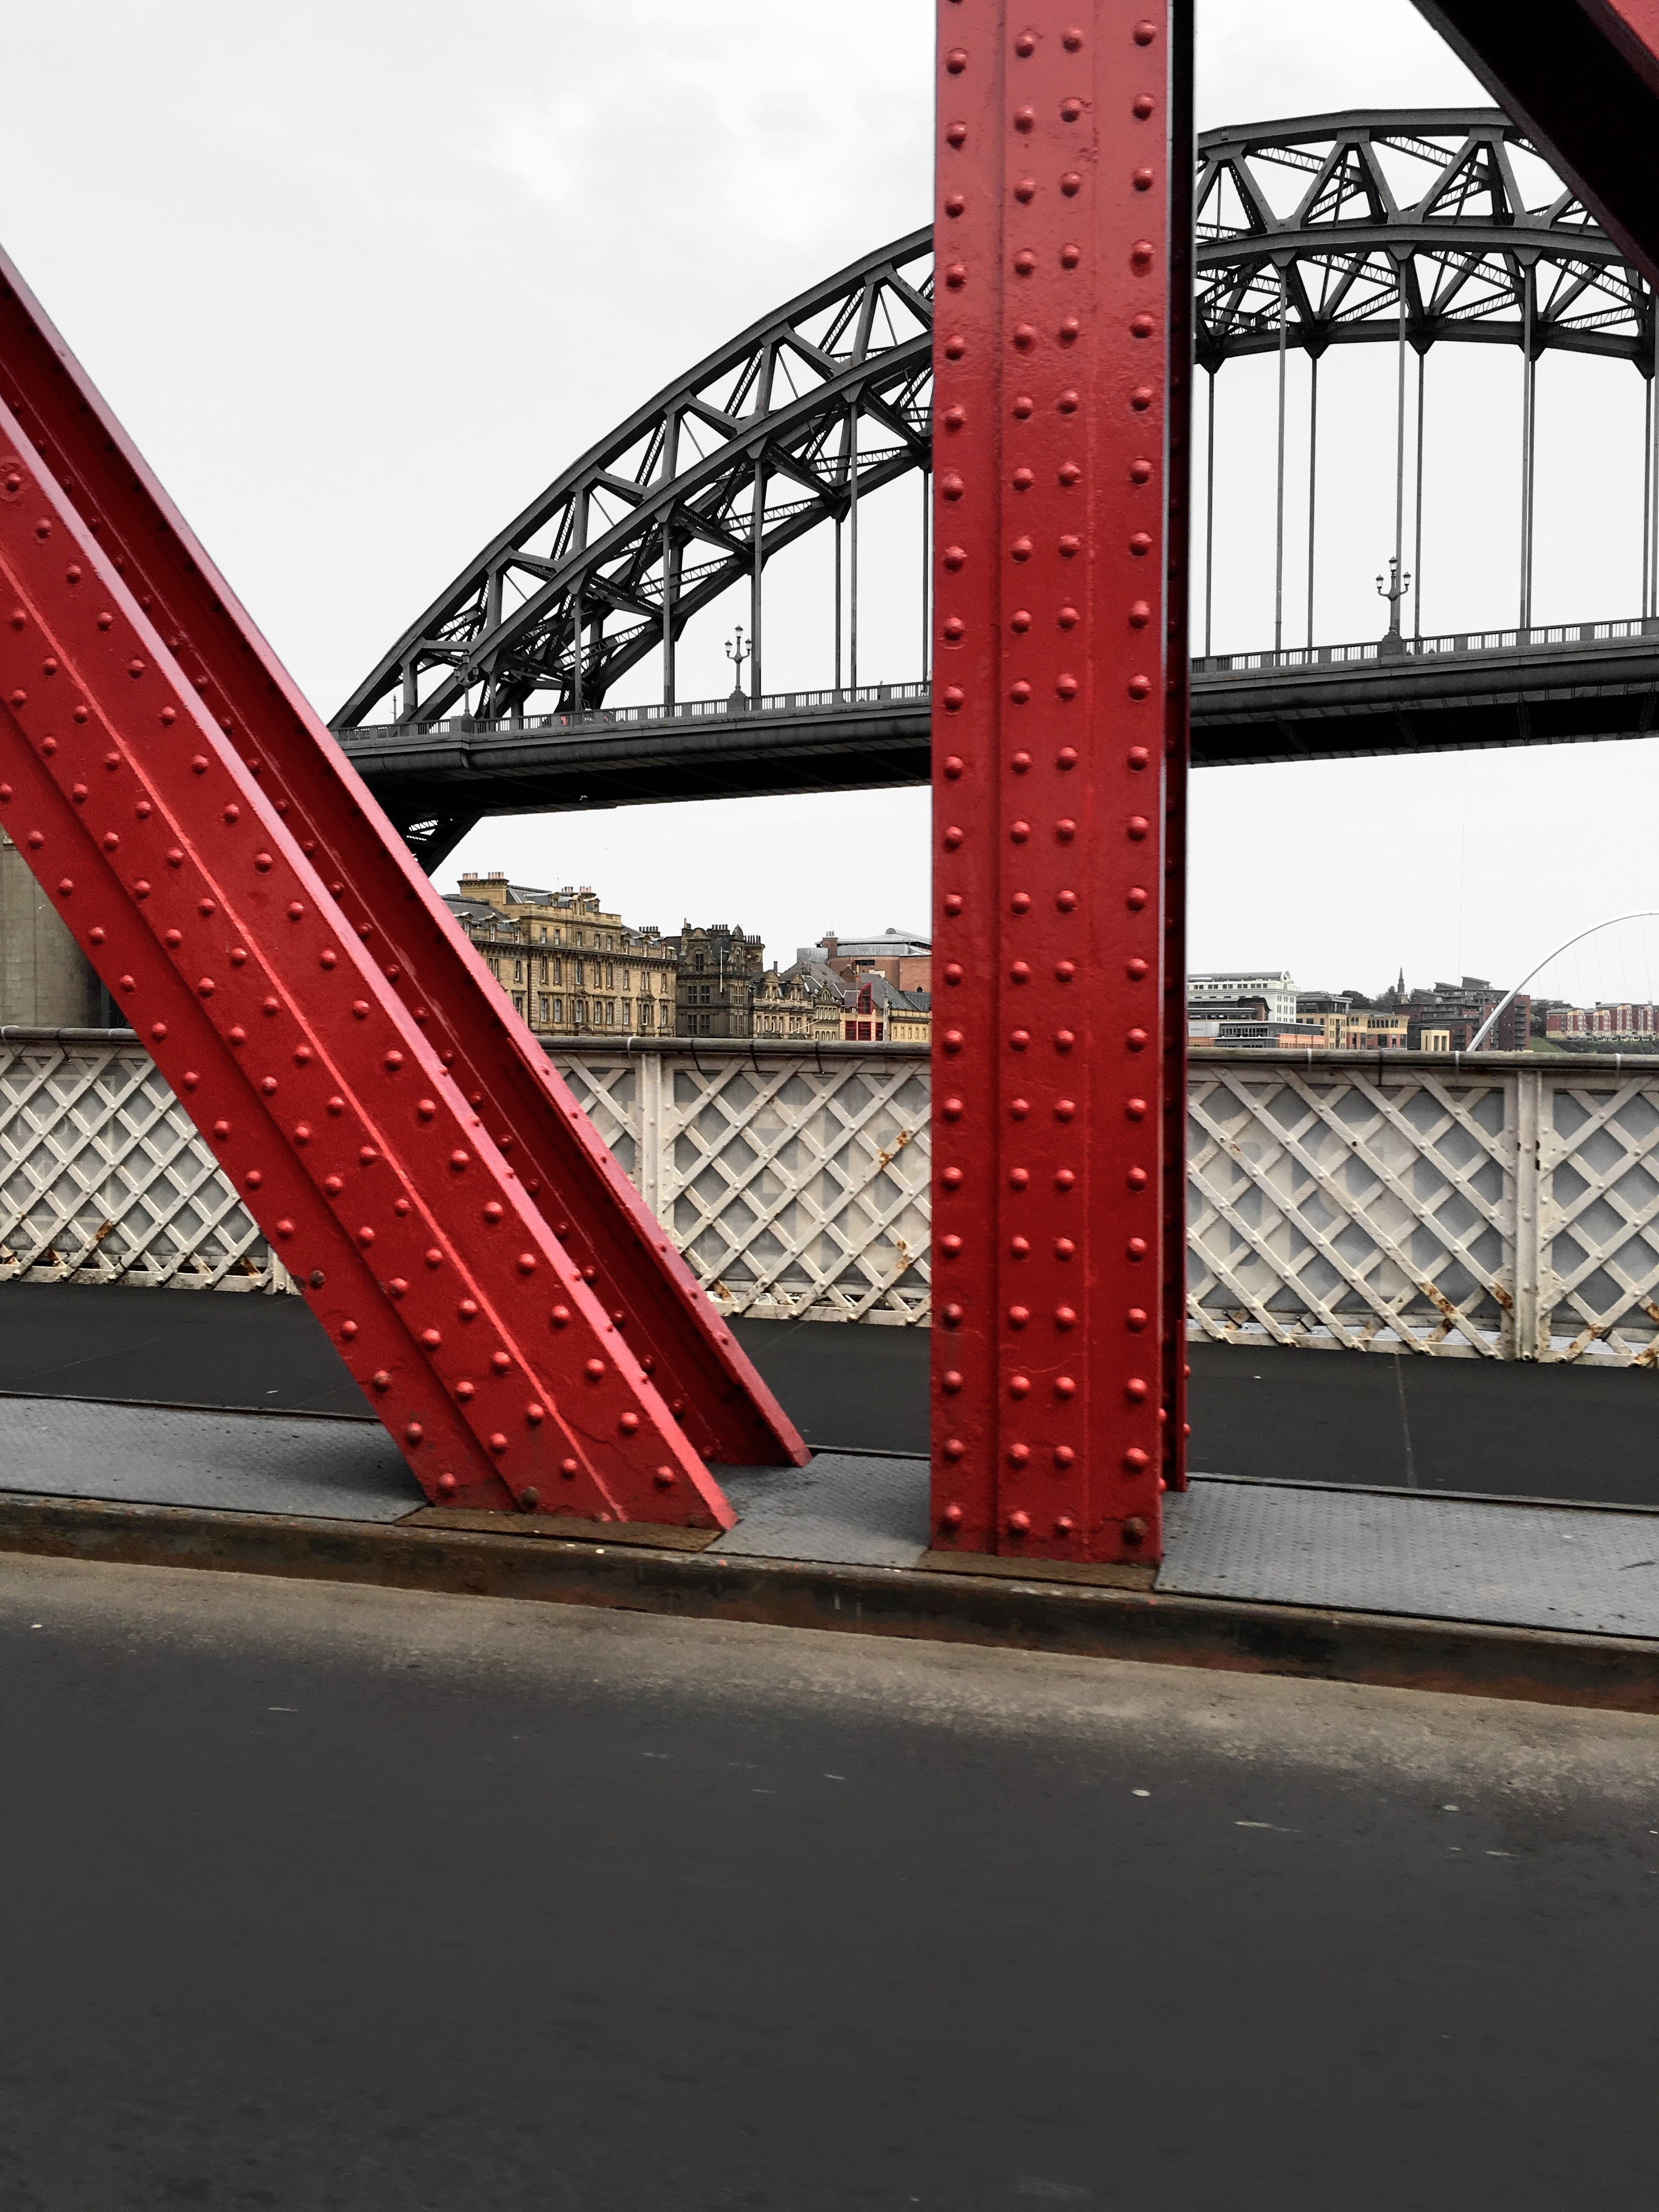 Free stock photo of bridge, Gateshead, newcastle, Newcastle upon tyne